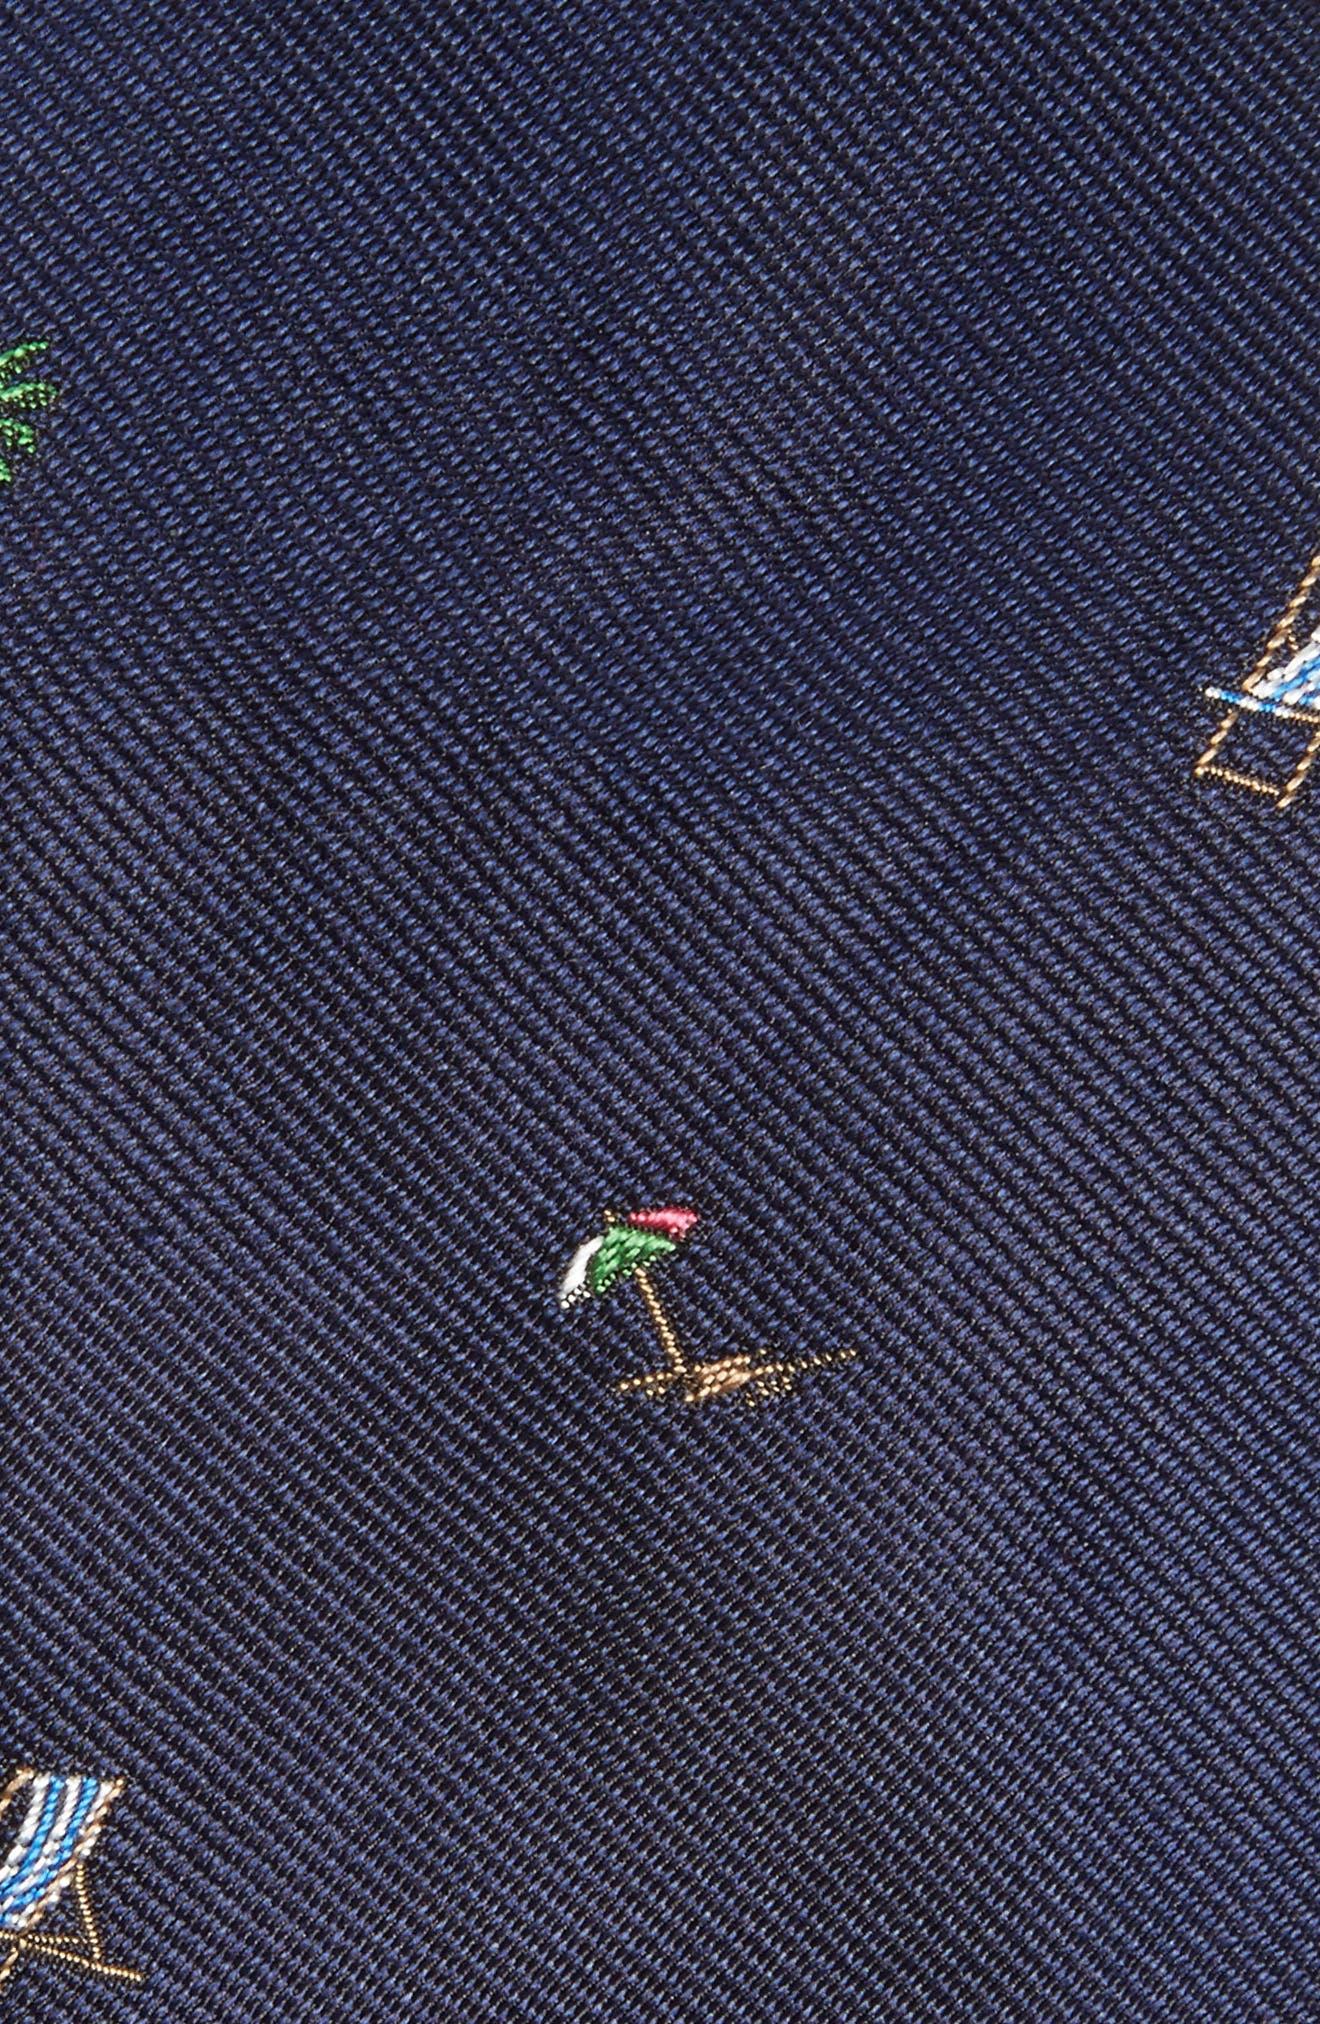 Vacation Silk Tie,                             Alternate thumbnail 2, color,                             Navy